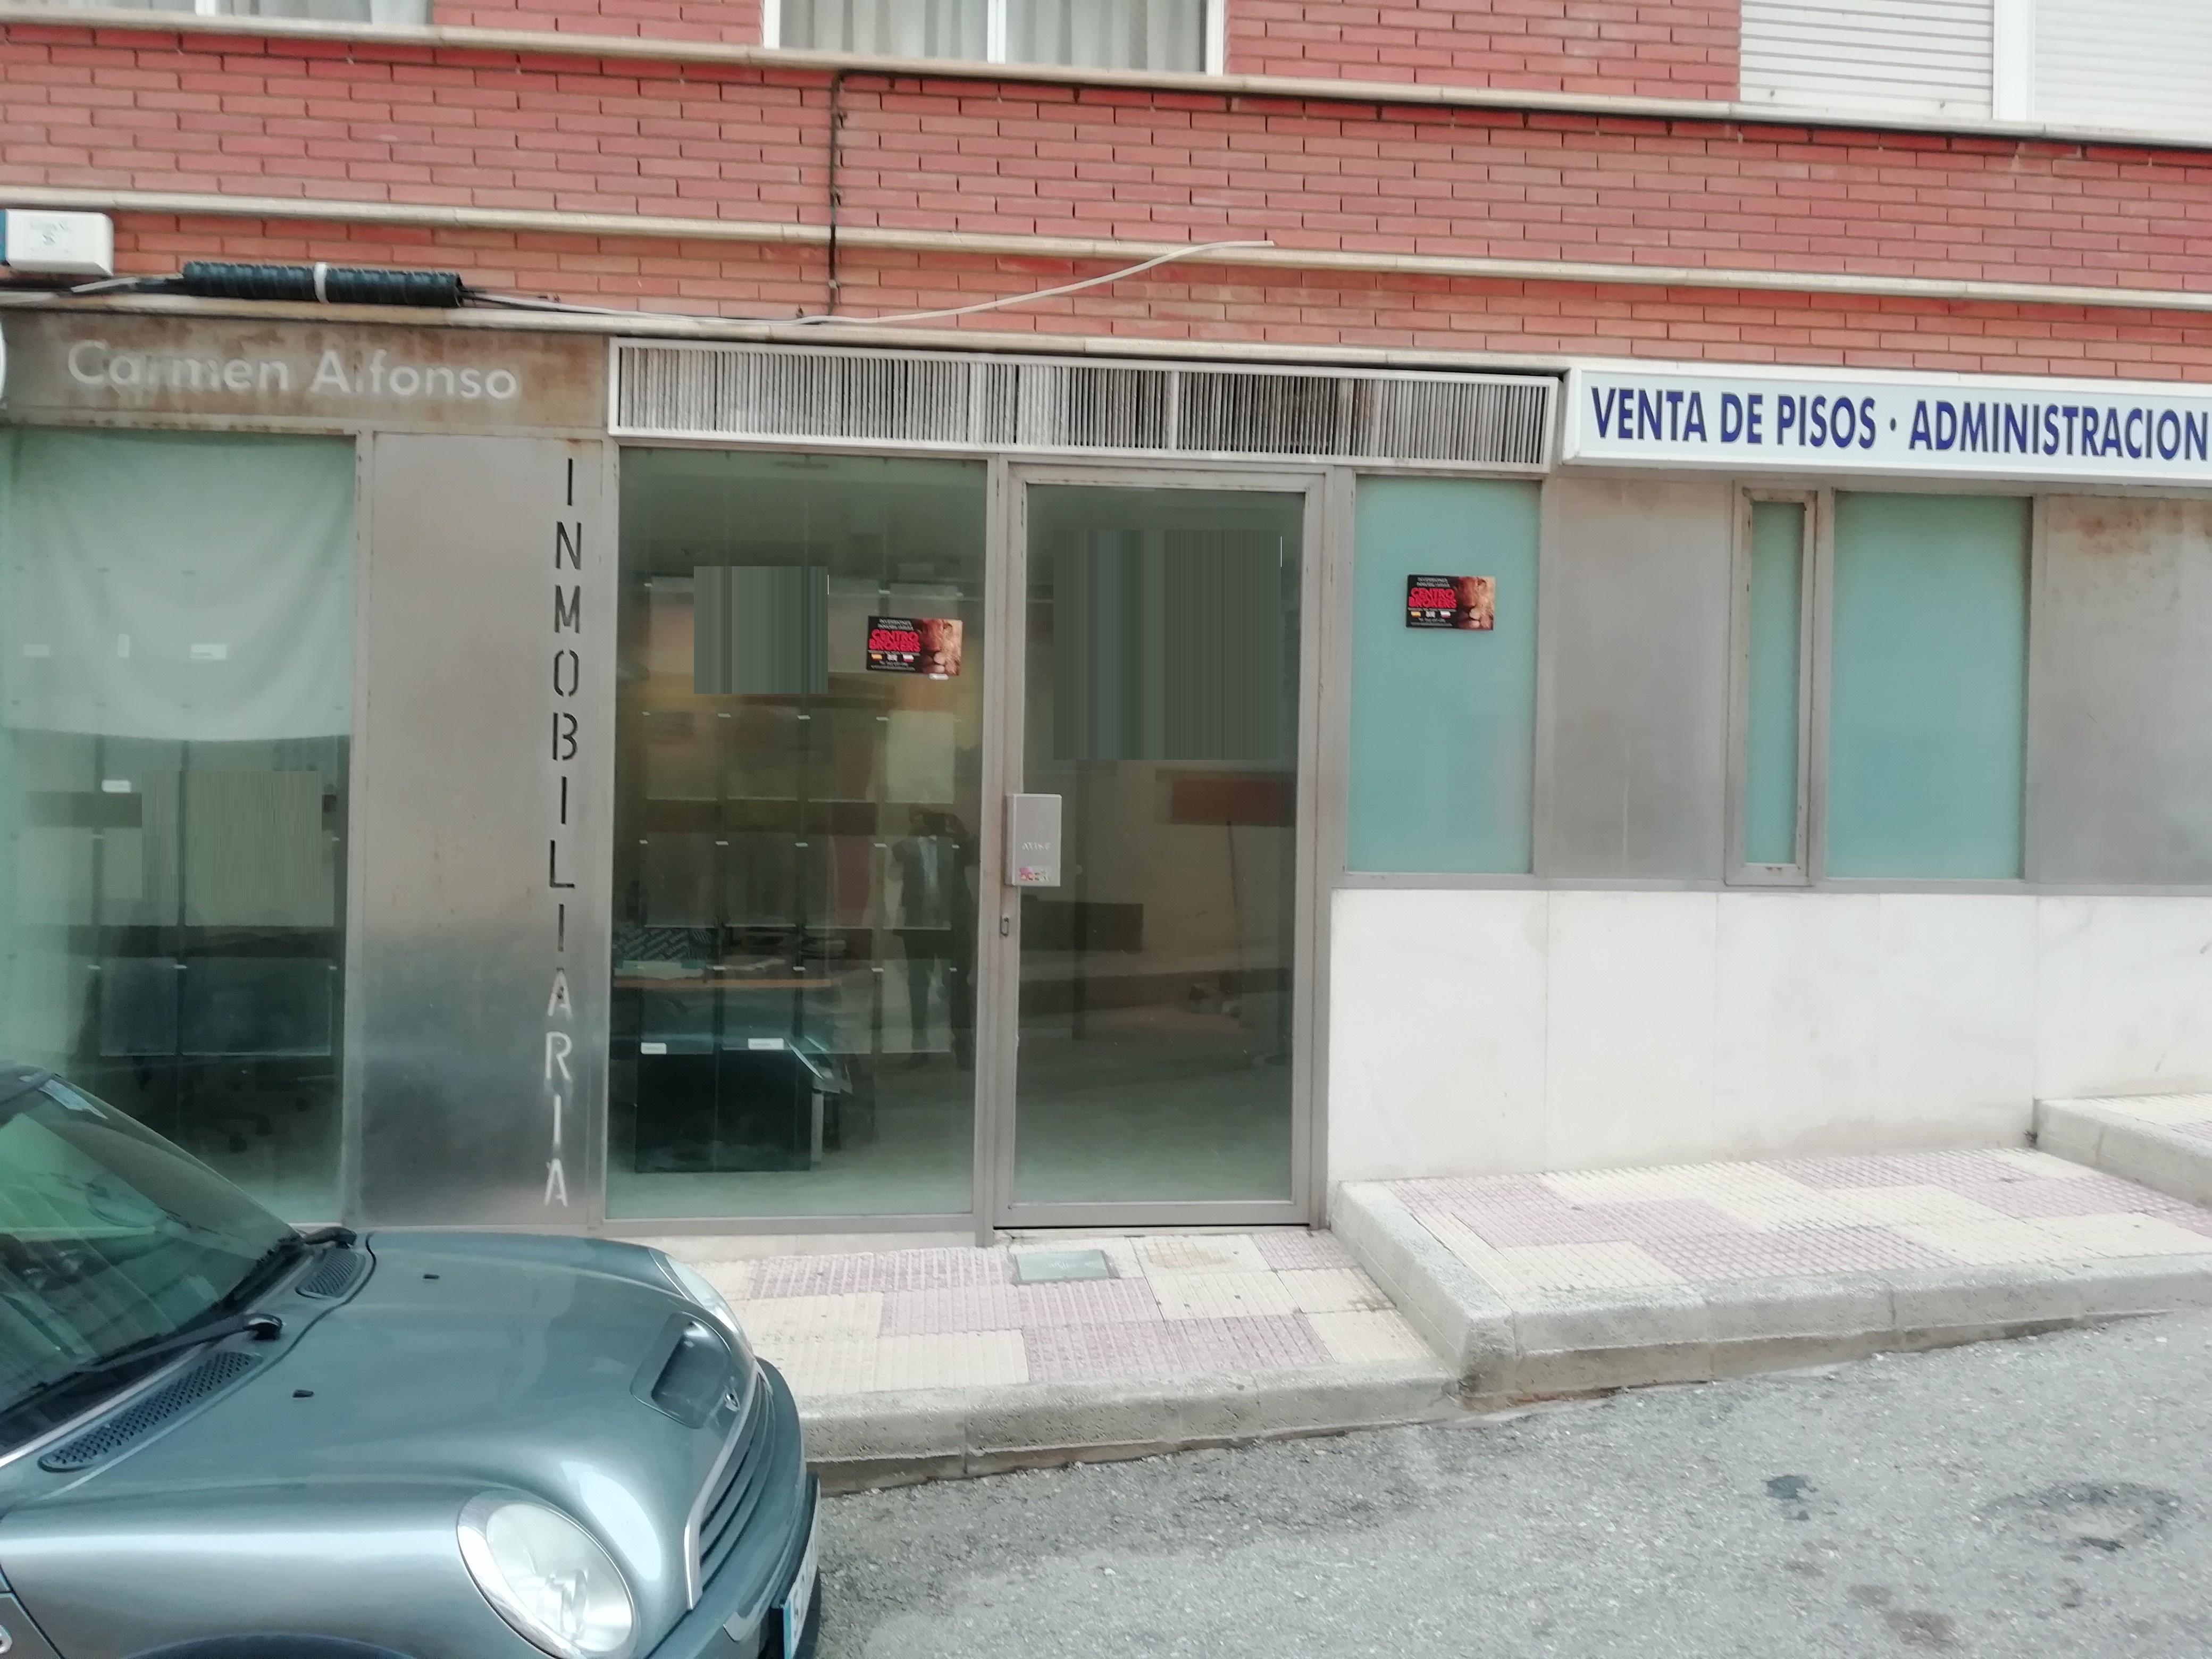 Bureau  Cullera - sant antoni. Estupendo despacho profesional en venta